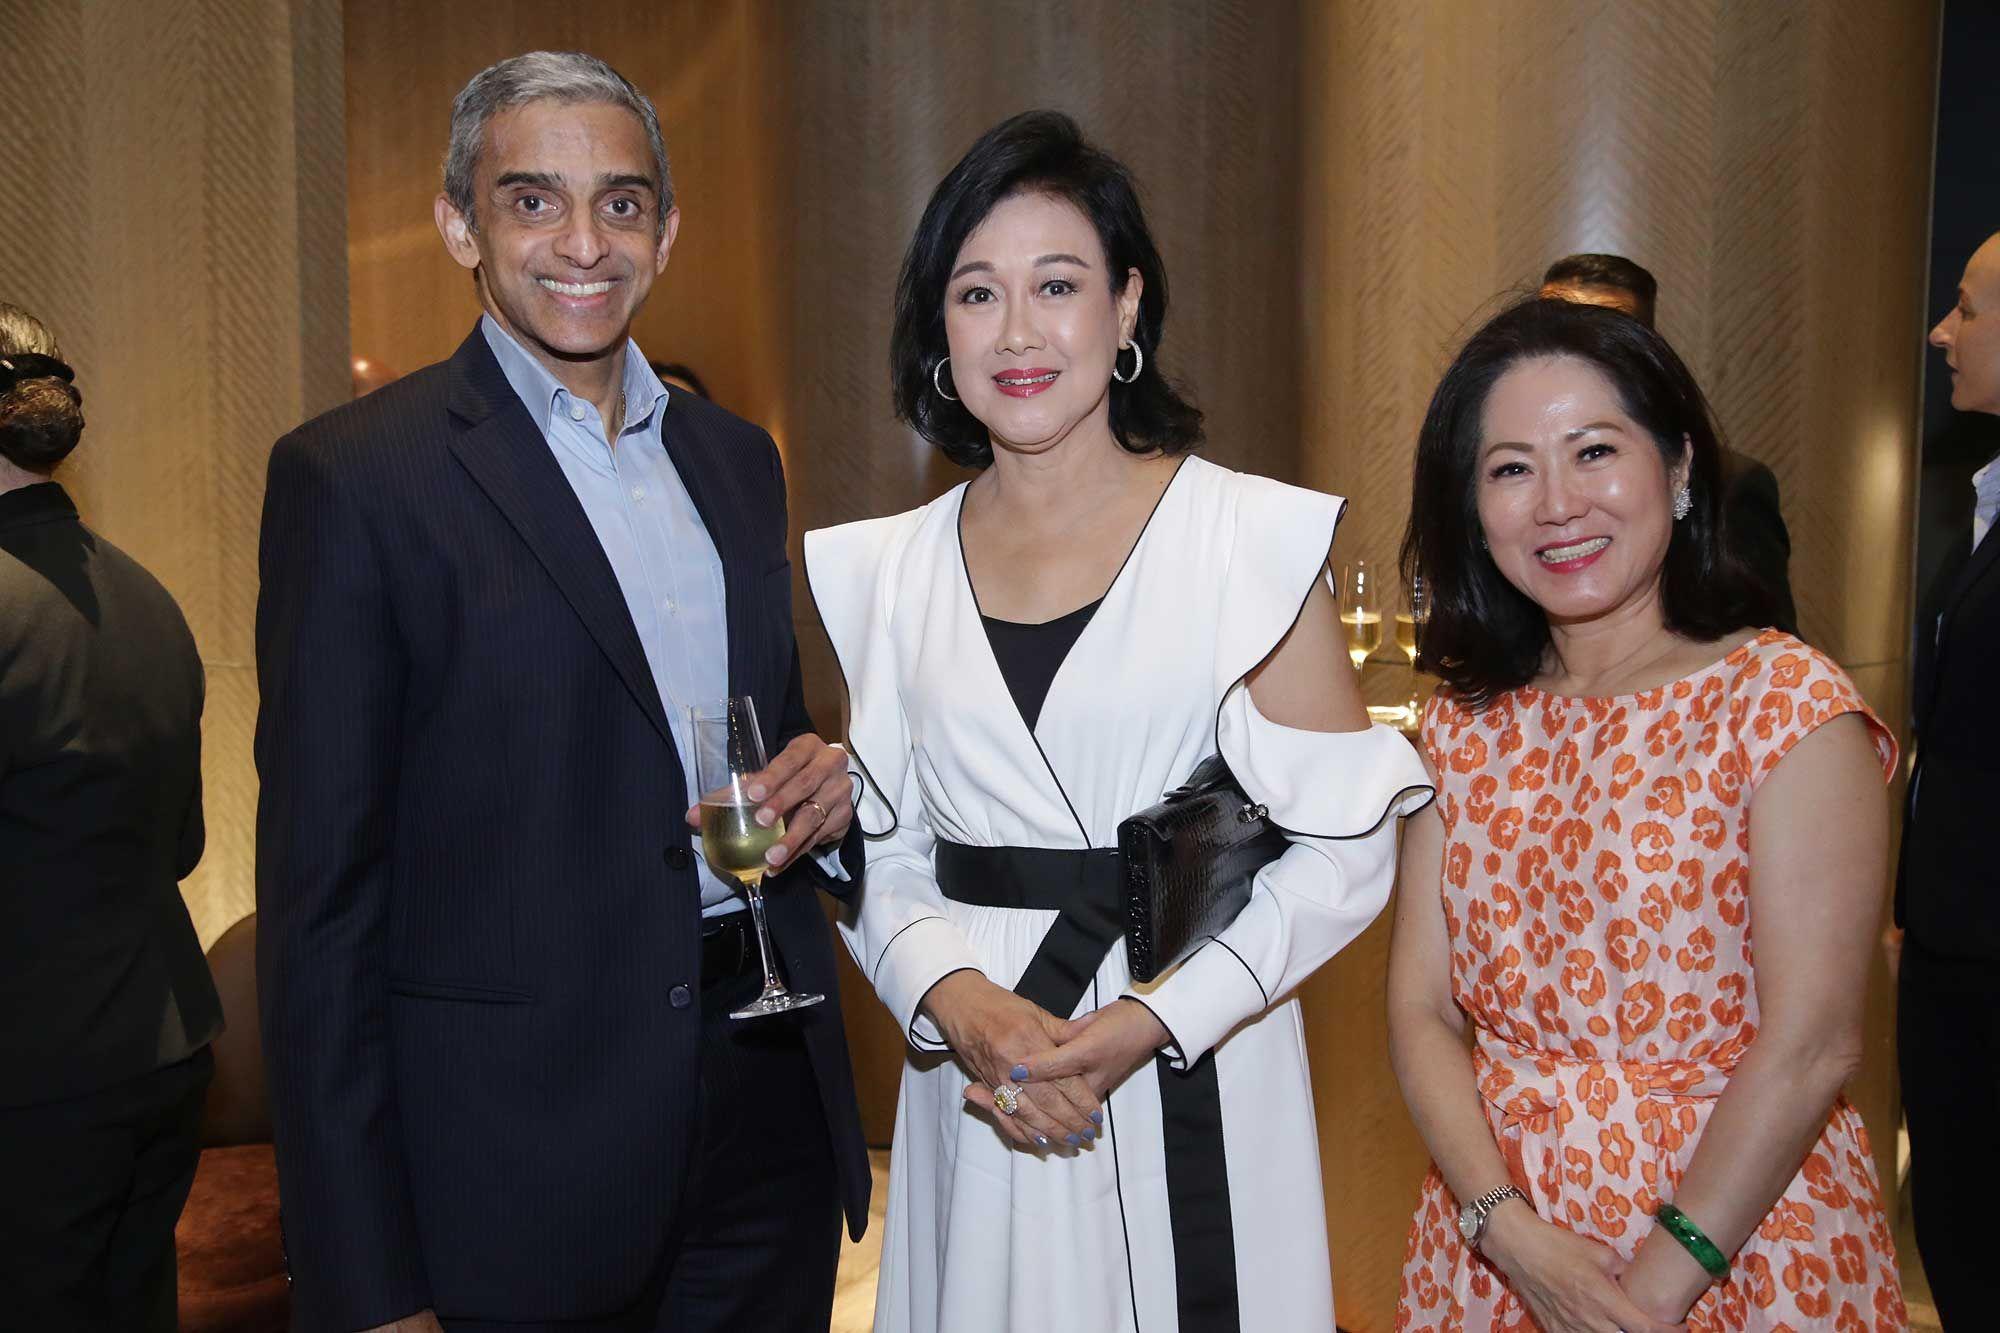 HE Vanu Gopala Menon, Puan Sri Ivy Tan and Datin Sri Lim Siew Swan